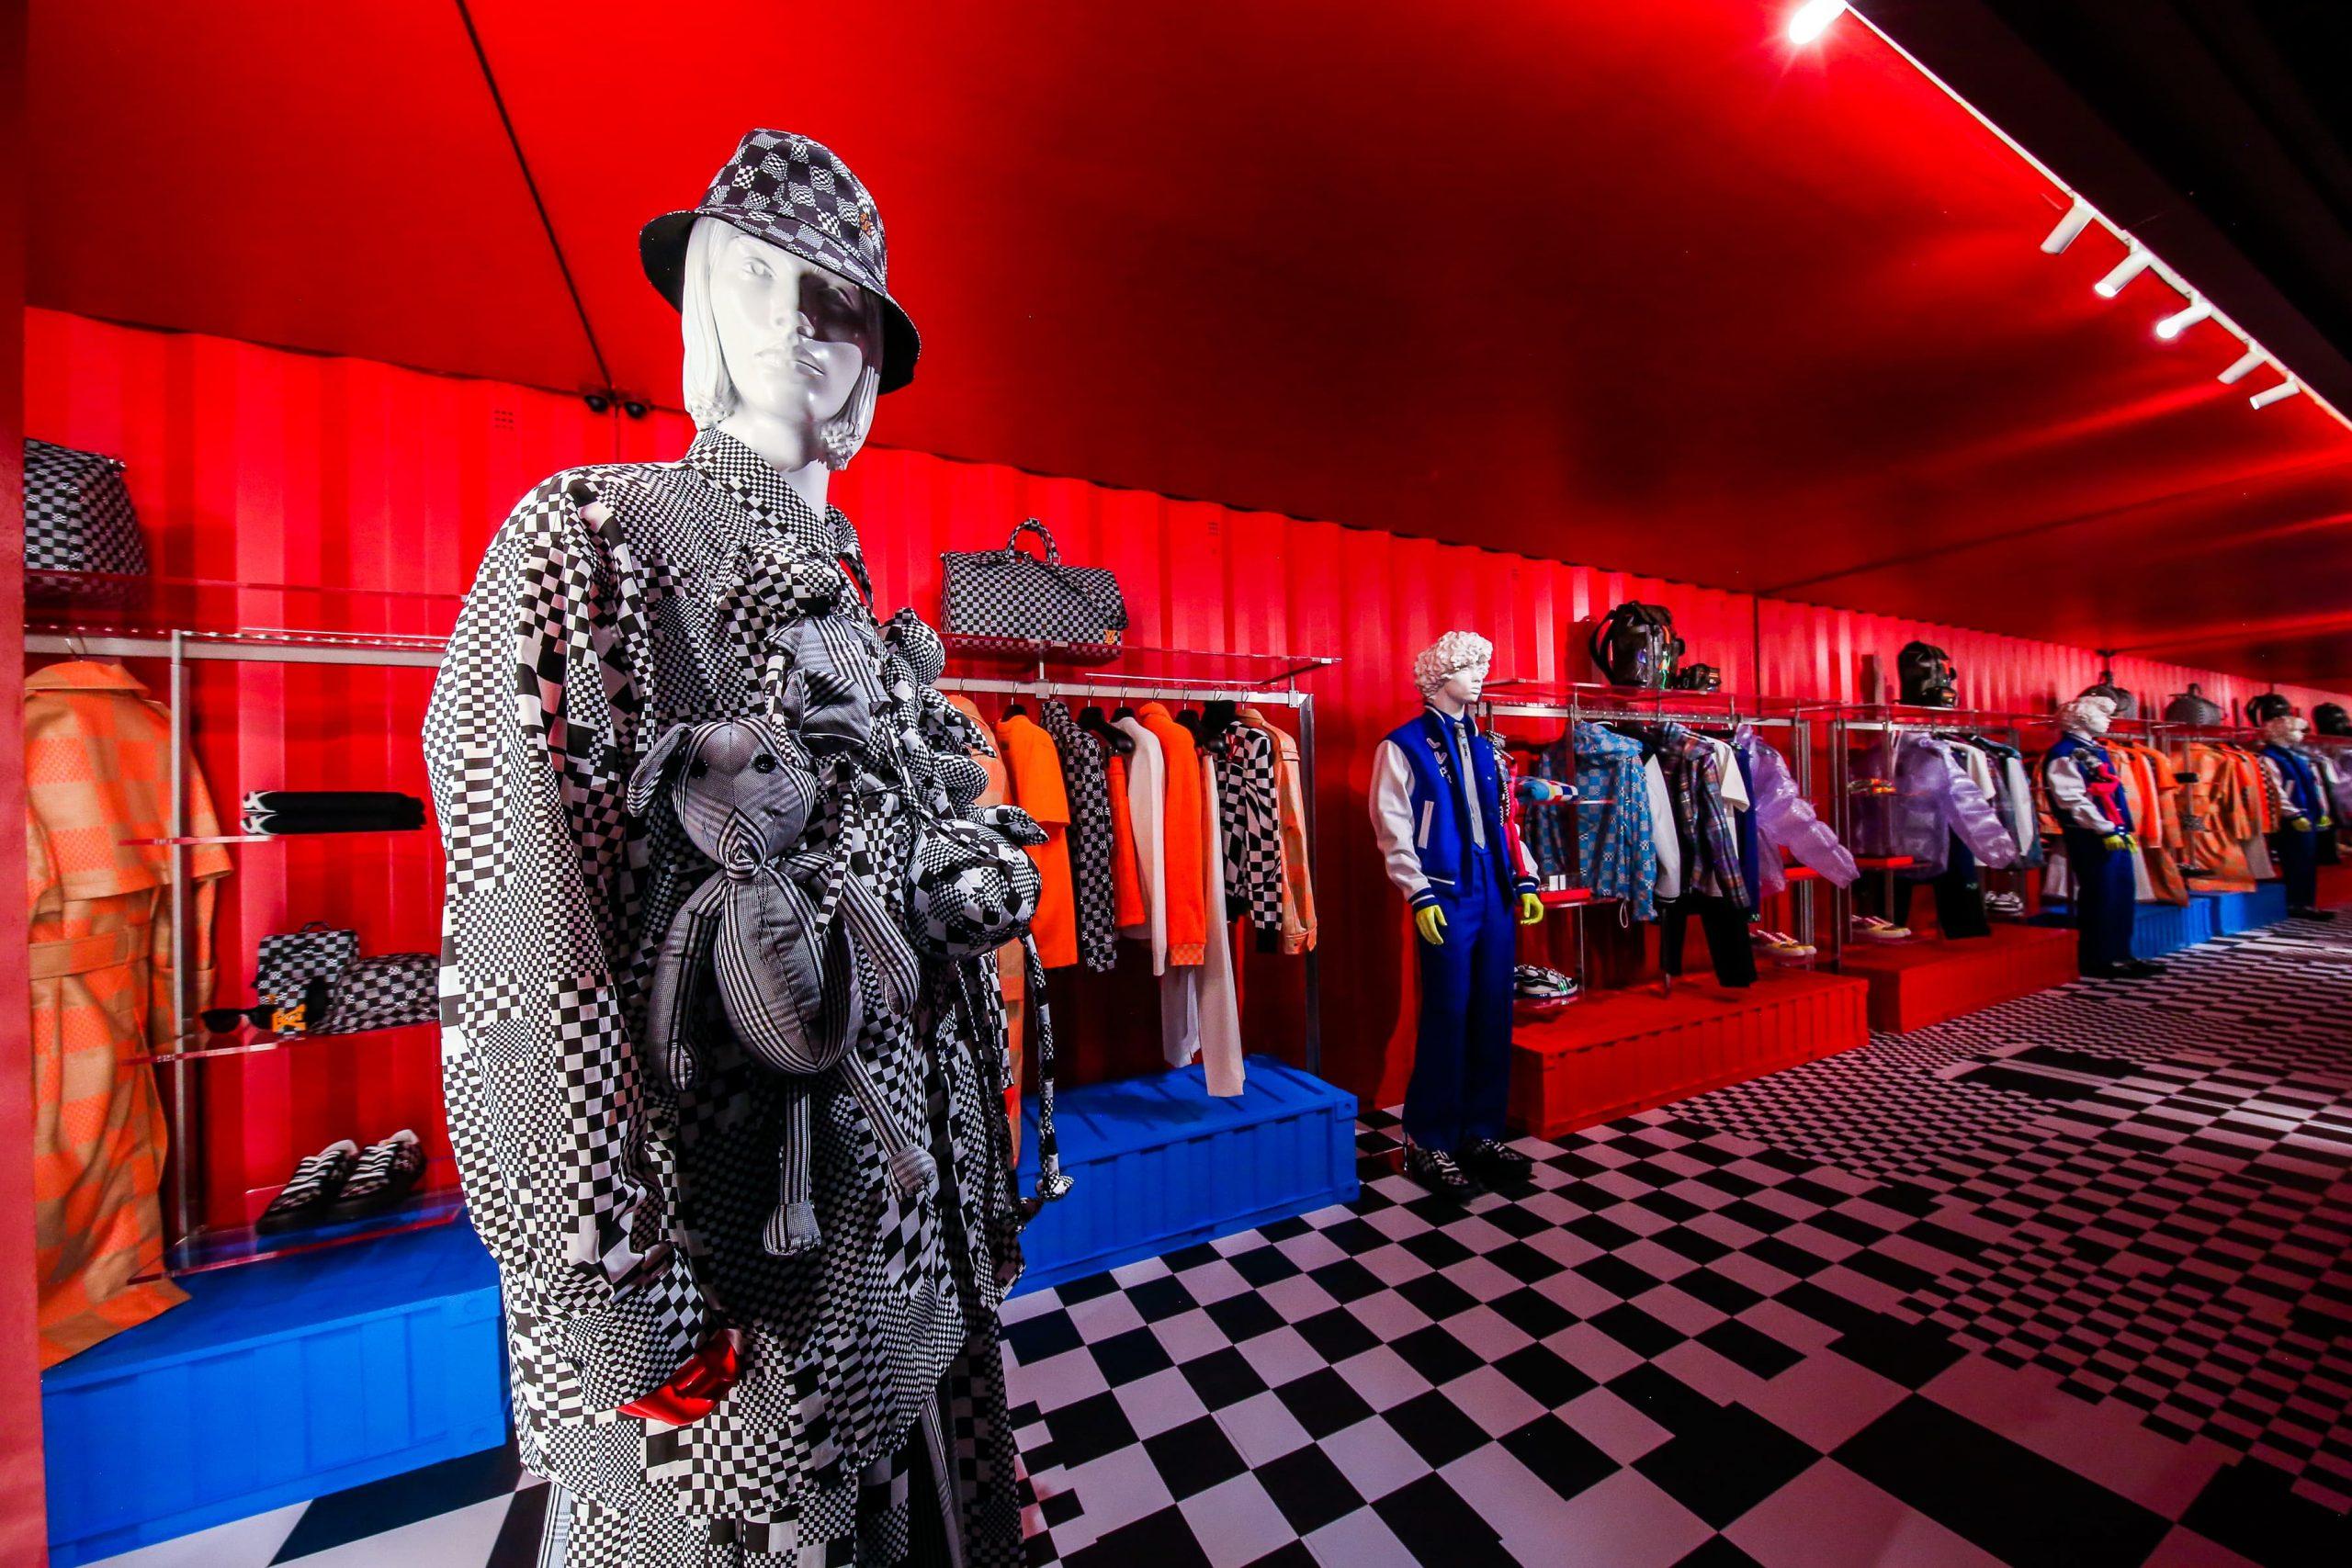 Louis Vuitton Opens Men's Pop-up on Rodeo Drive